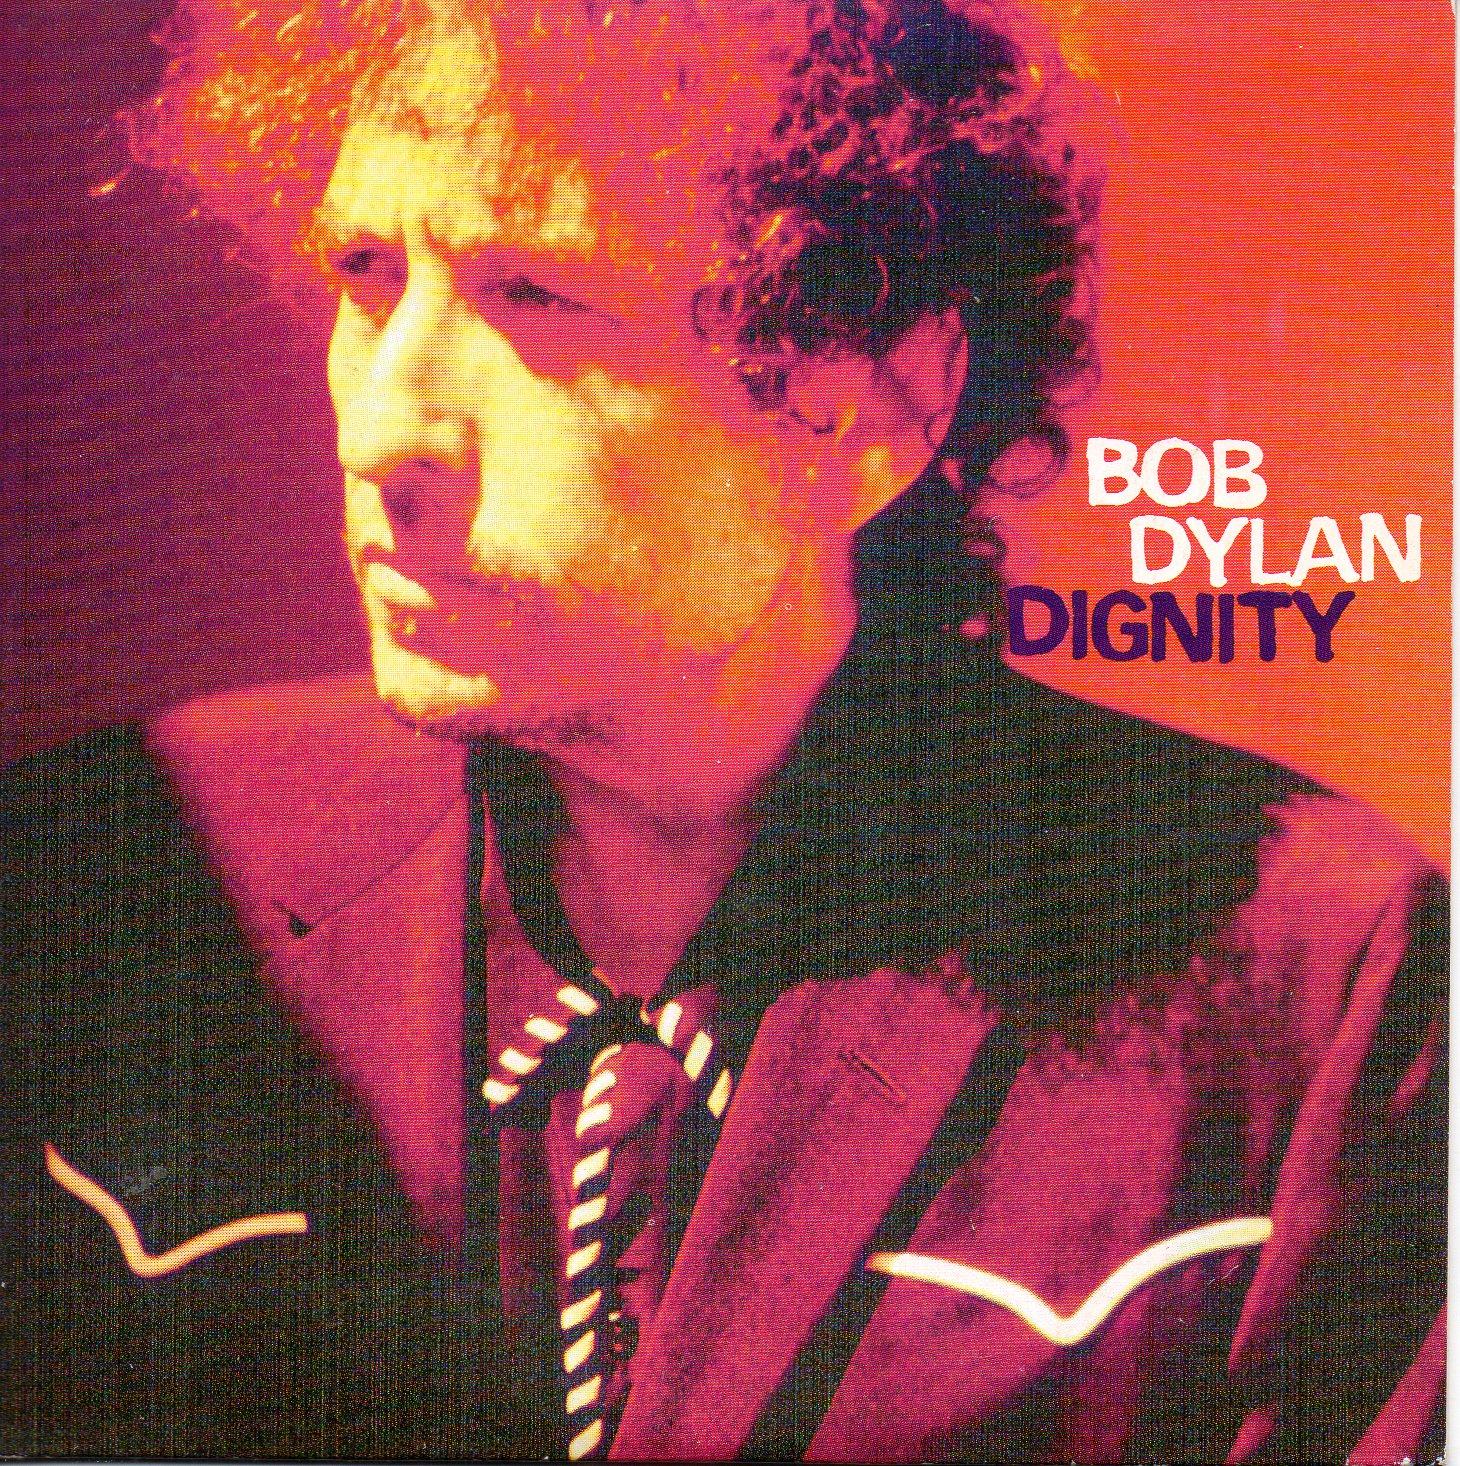 BOB DYLAN - Dignity 2-track CARD SLEEVE - CD single